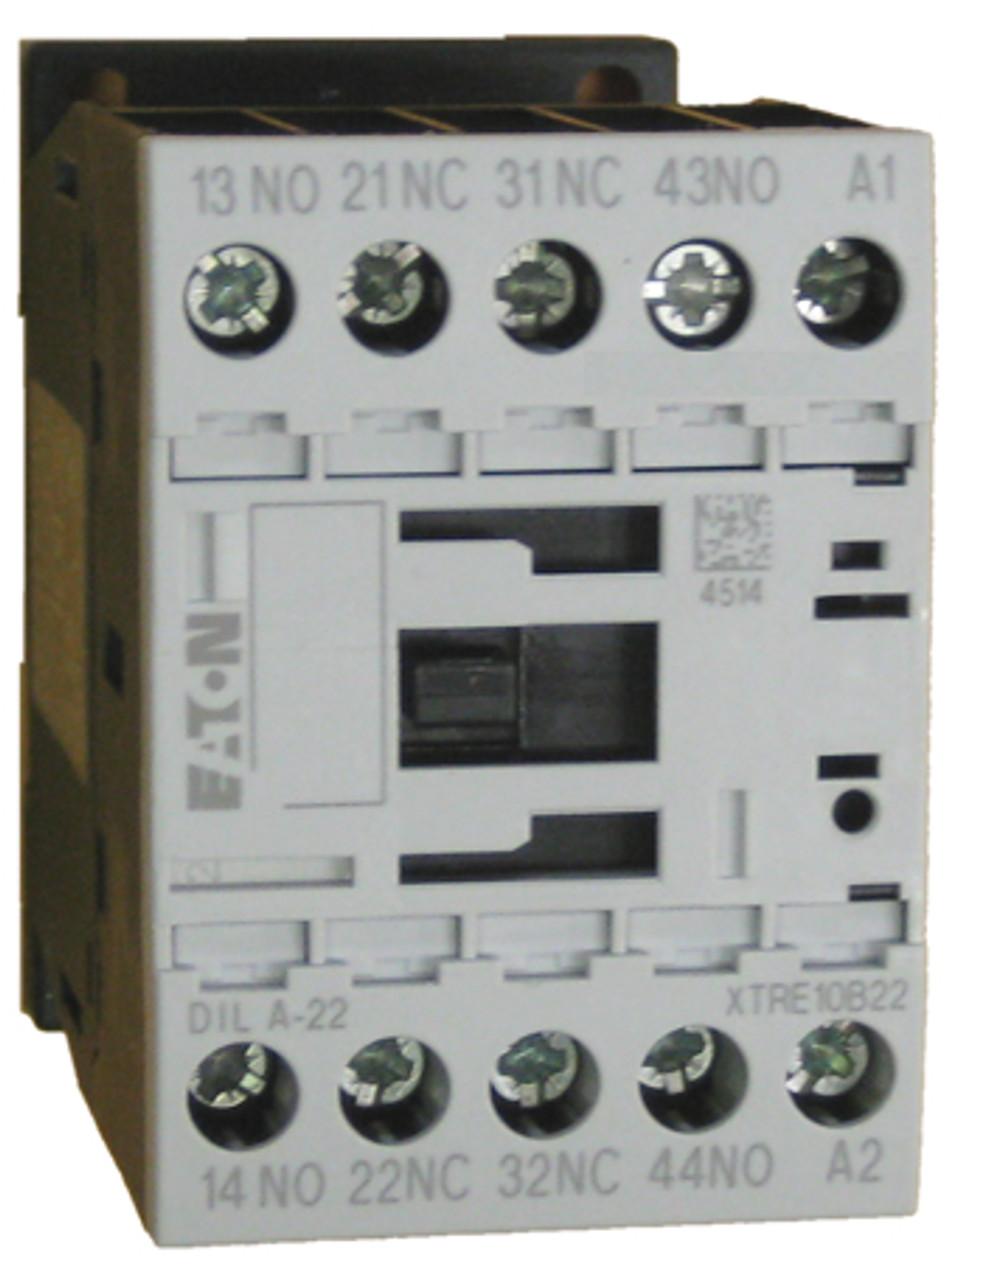 Eaton/Moeller DILA-22 control relay